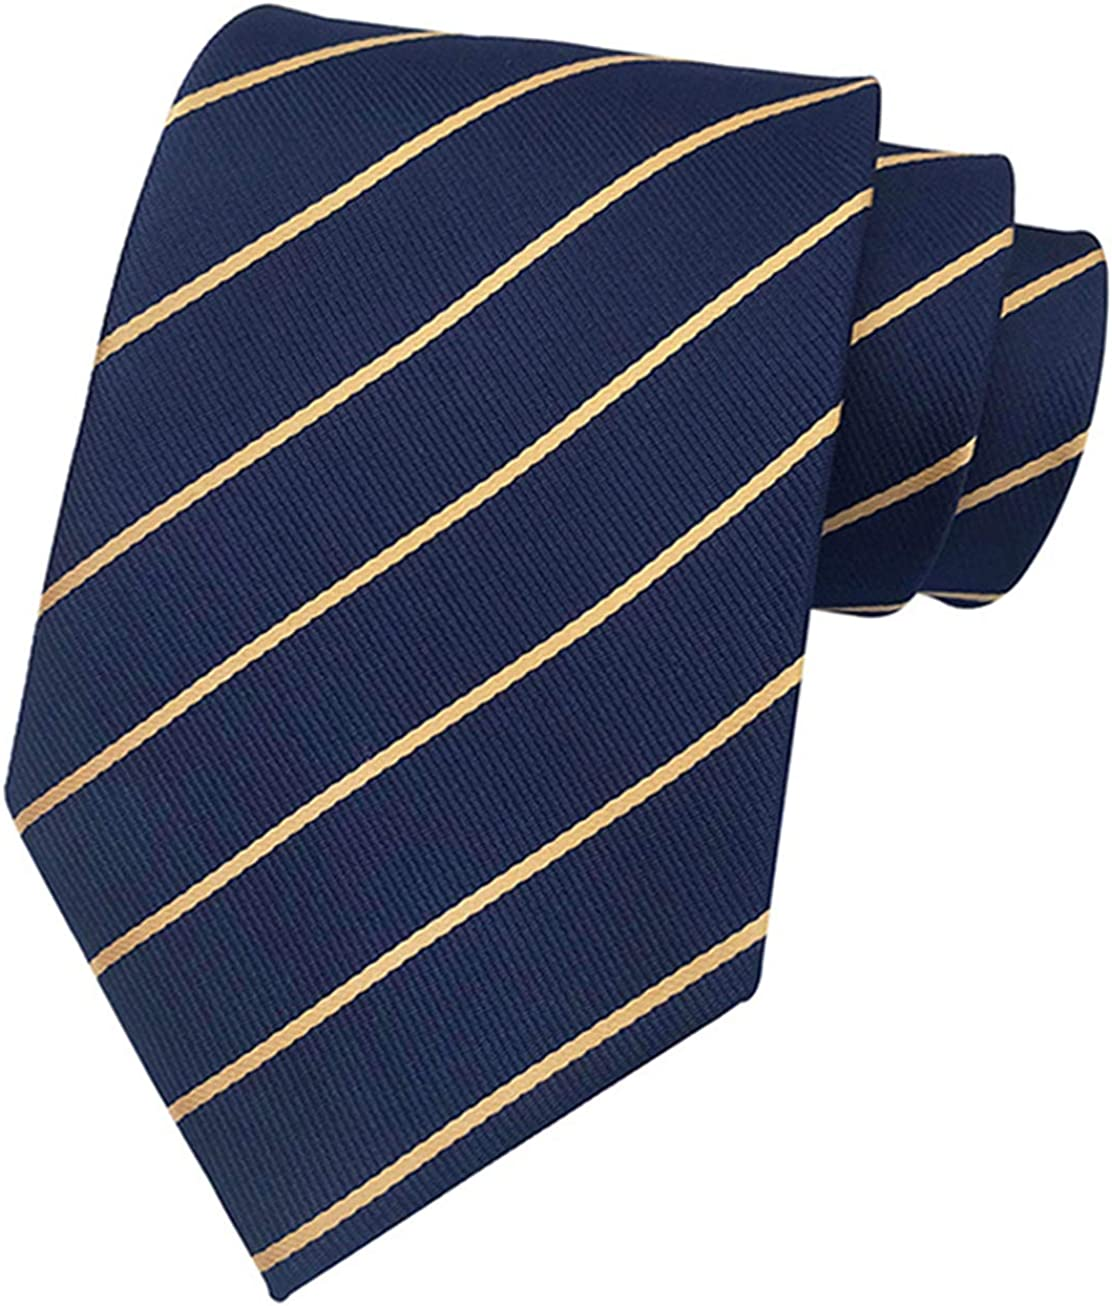 New Classic Striped Ties WOVEN JACQUARD 100/% Silk Men/'s Suits Tie Necktie #L424